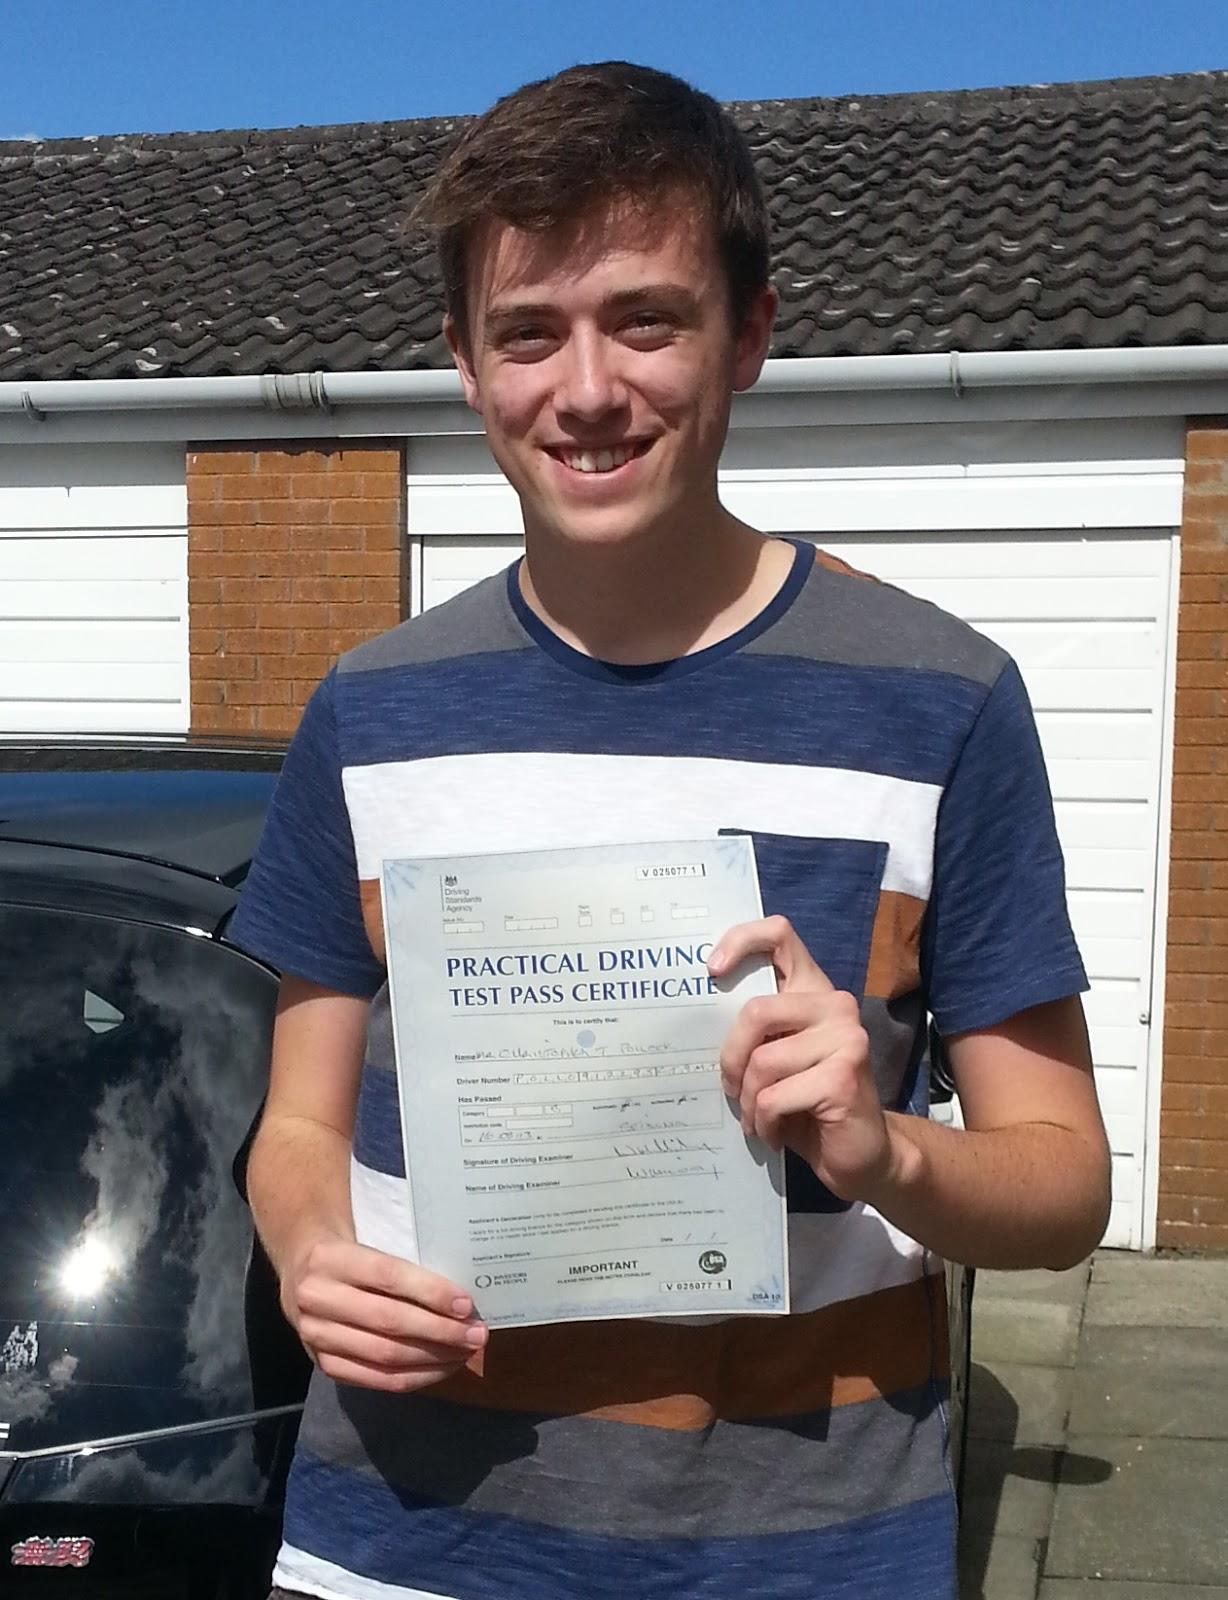 Chris Pollock driving test pass